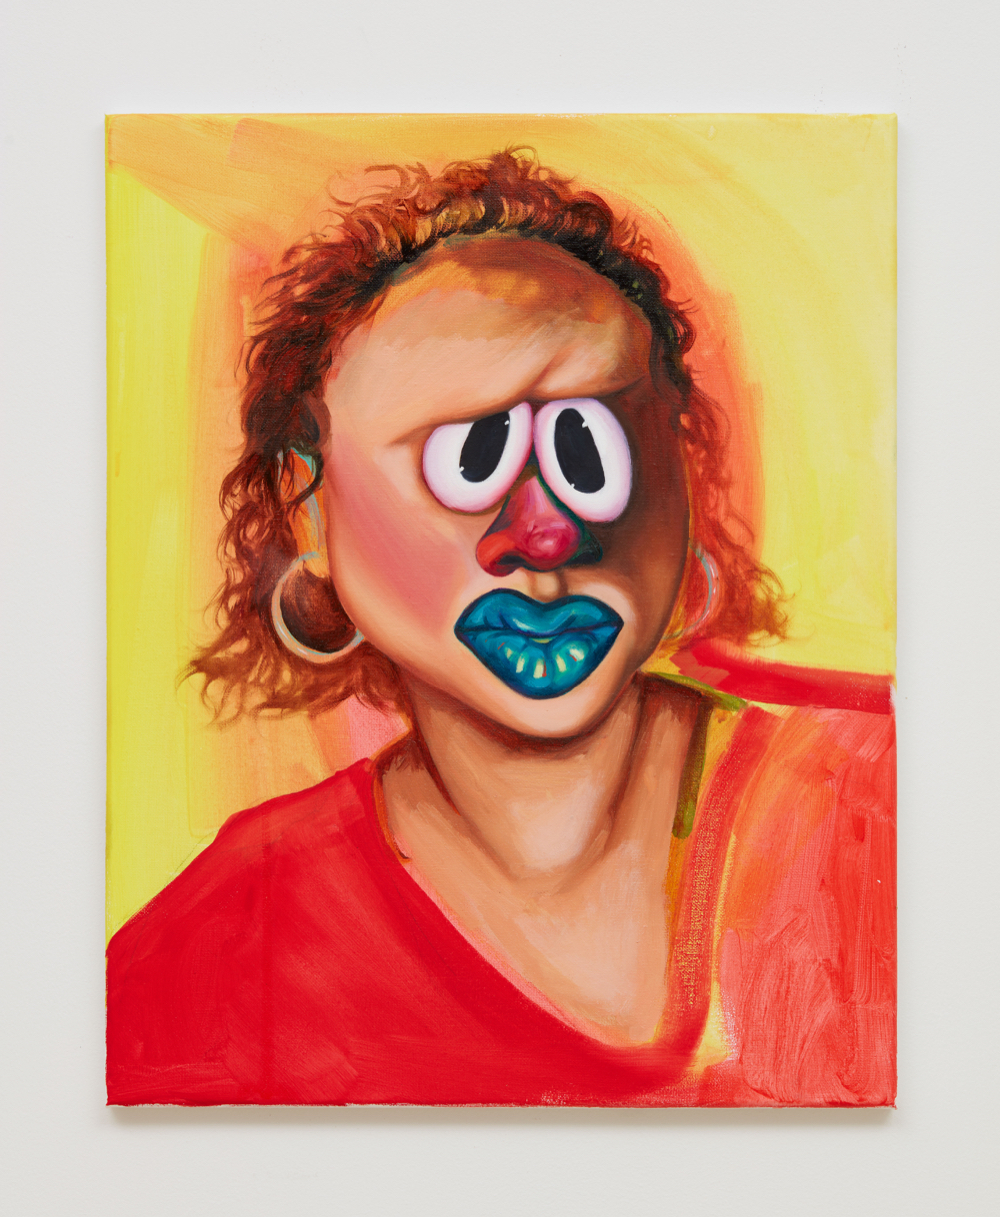 Cliche Art Exhibition